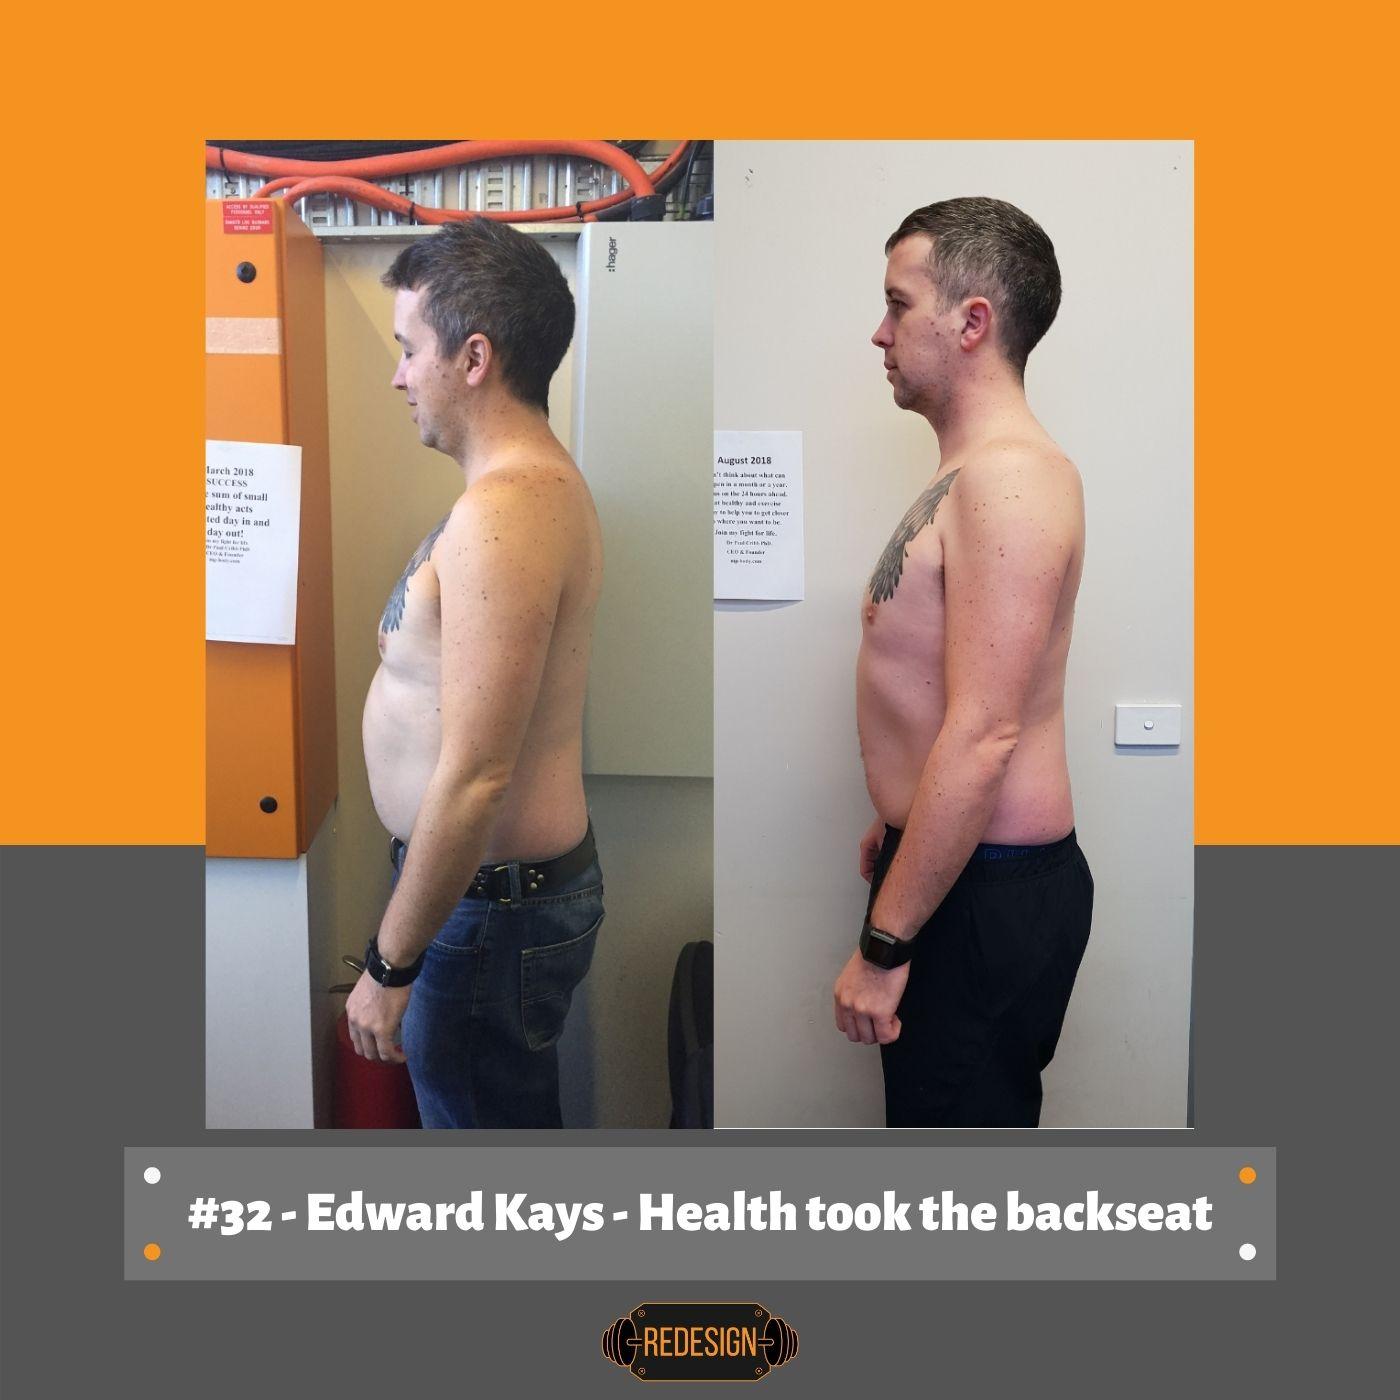 Episode 032 - Edward Kays - The unwanted 30kgs